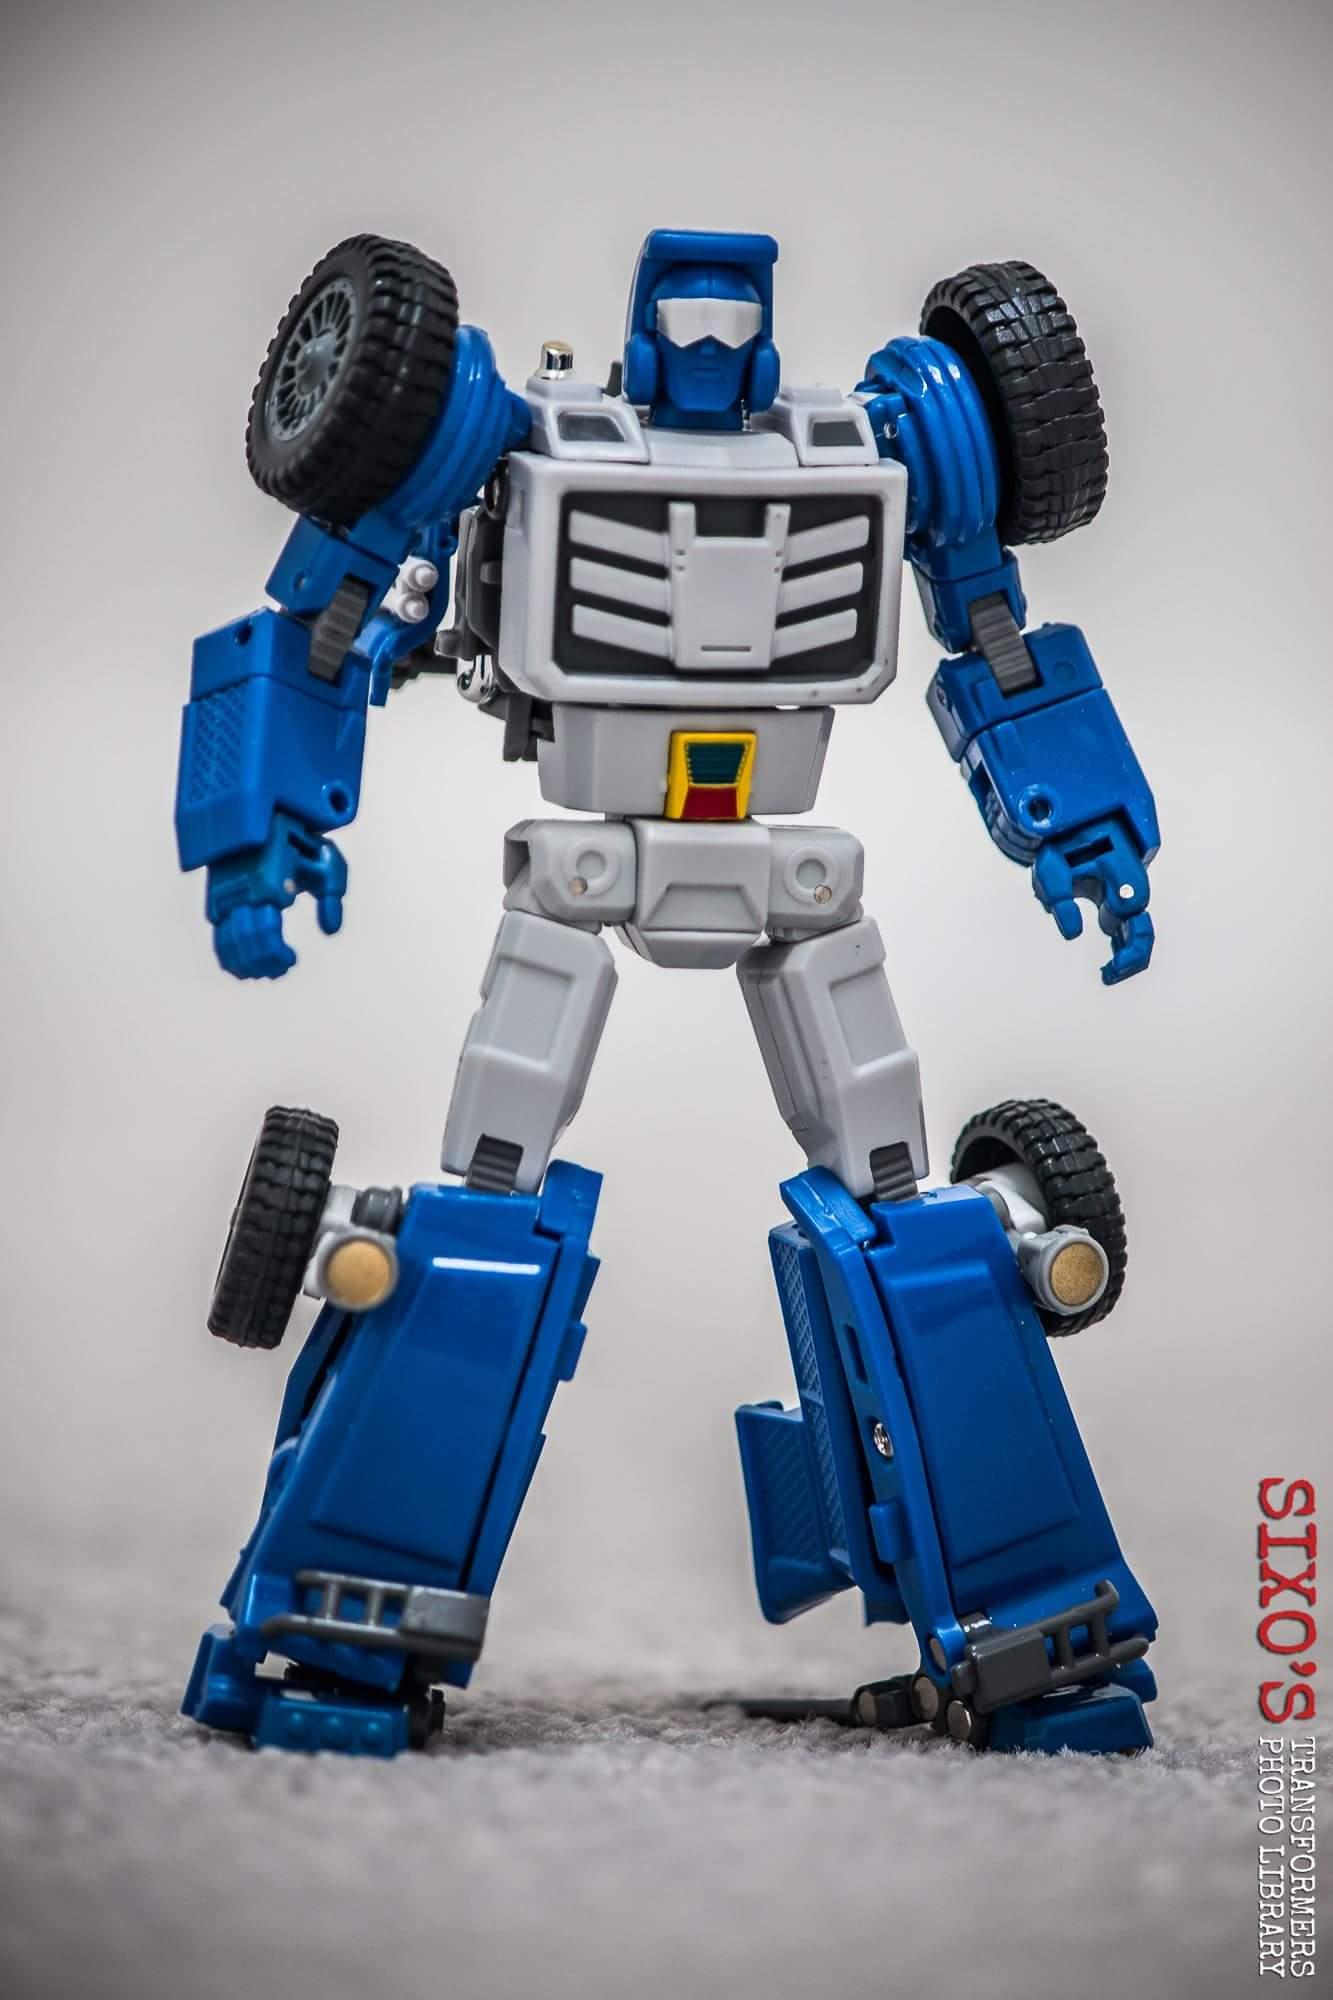 [X-Transbots] Produit Tiers - Minibots MP - Gamme MM - Page 6 Tu1VNUOg